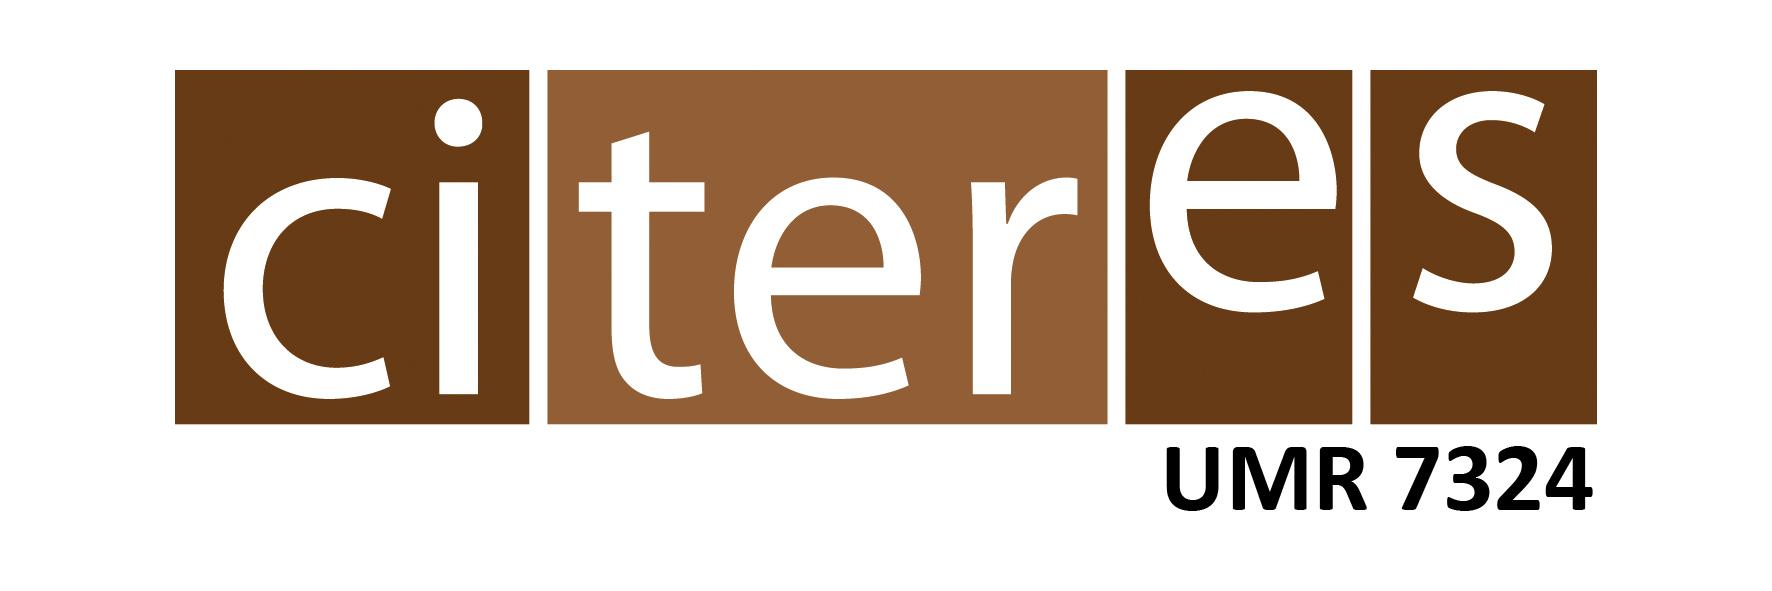 logo_CITERES